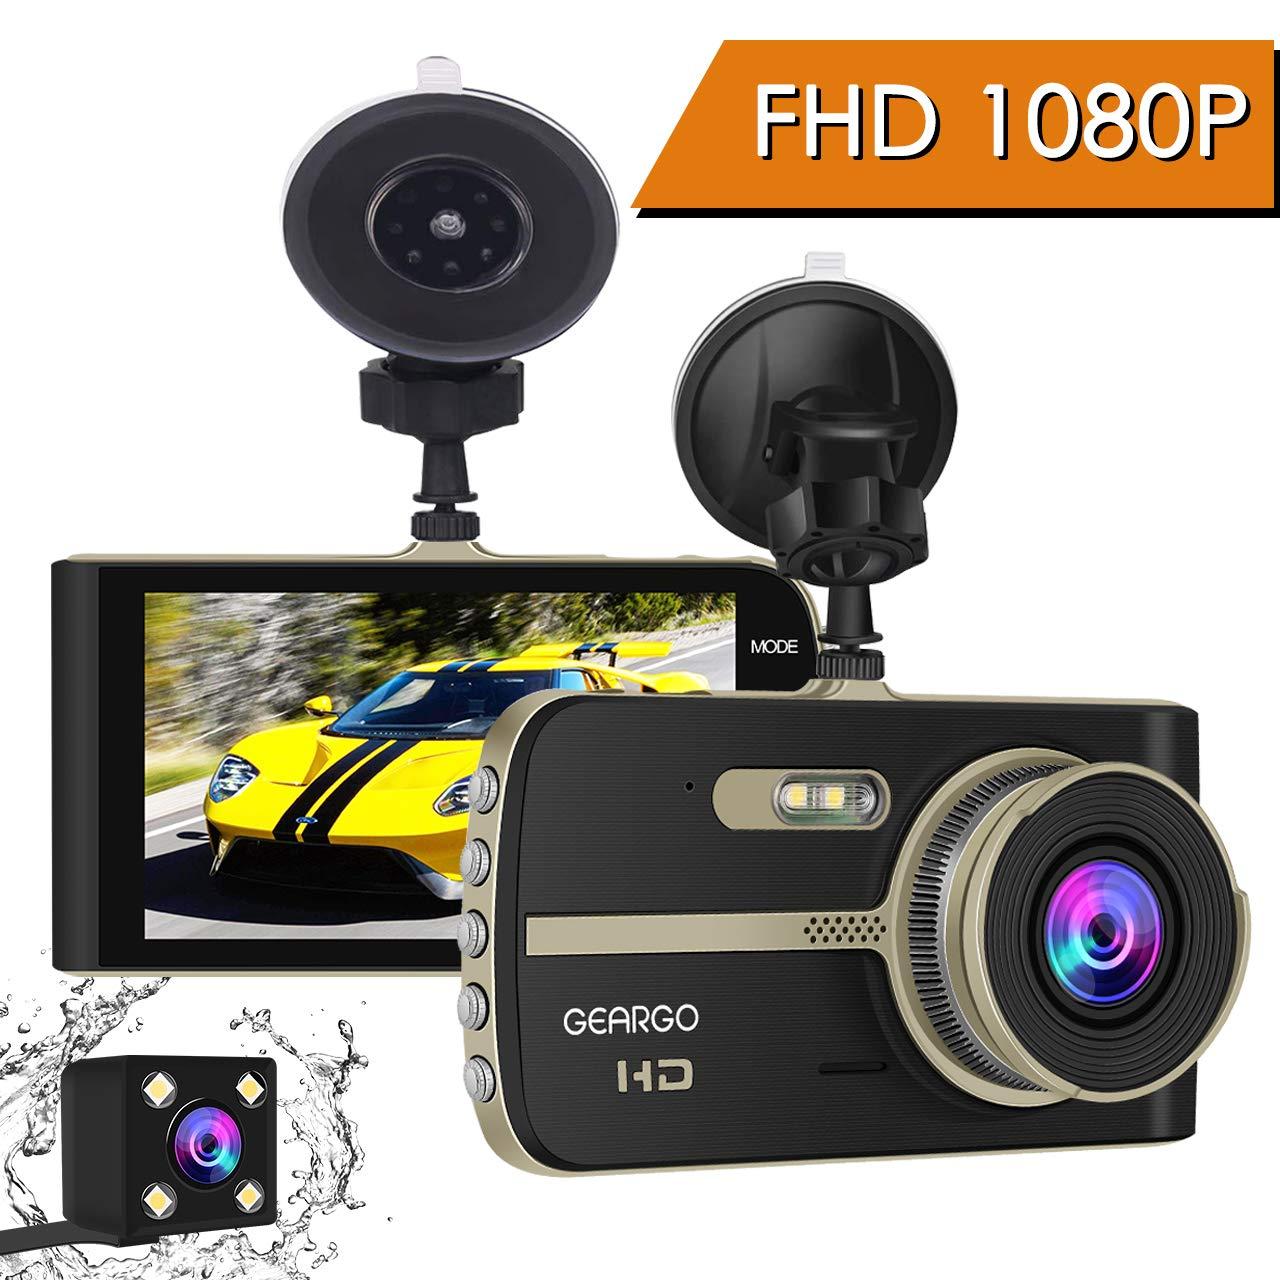 Cámara de Coche, GEARGO Dashcam Full HD 1080P Dual Lens Cámara para Coche G-Sensor Detección de Movimiento Grabación en Bucle con Visión Noctura WDR 4″LCD Pantalla